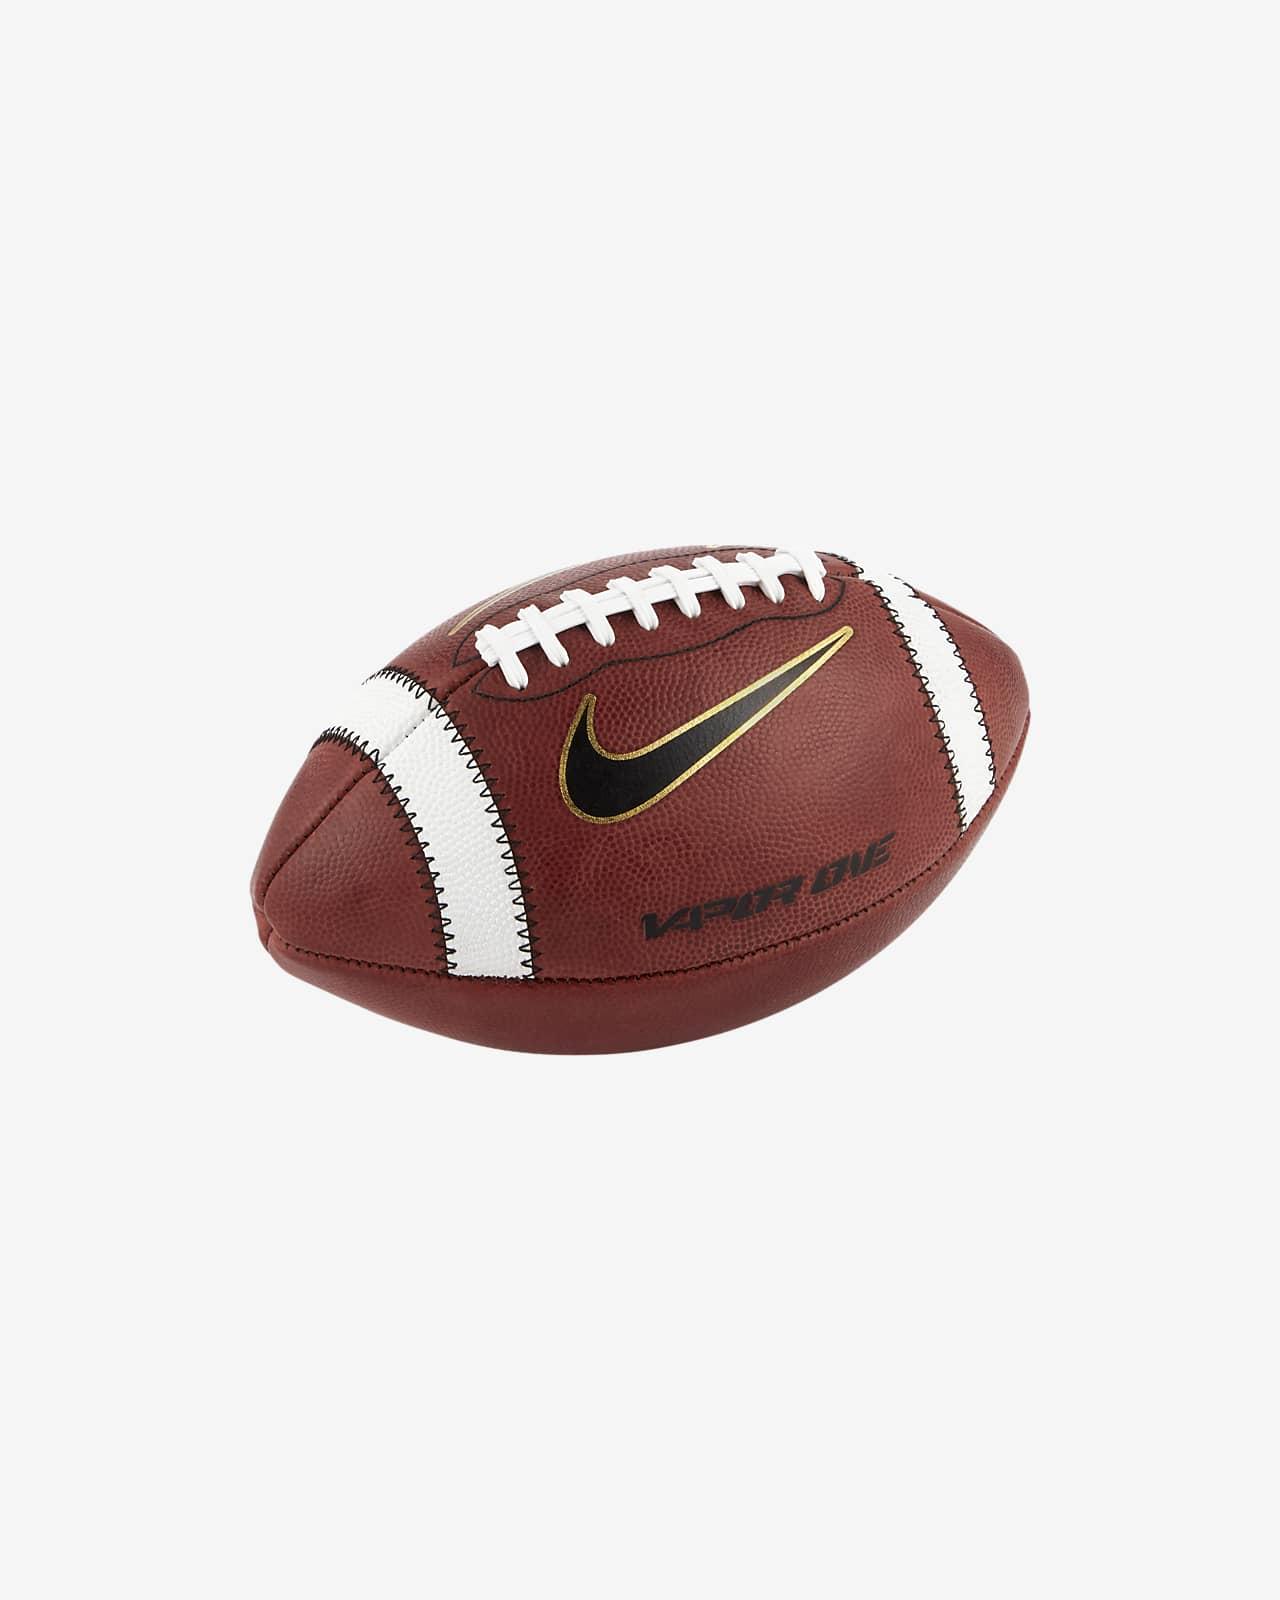 Nike Vapor 1 Official Football (Deflated)